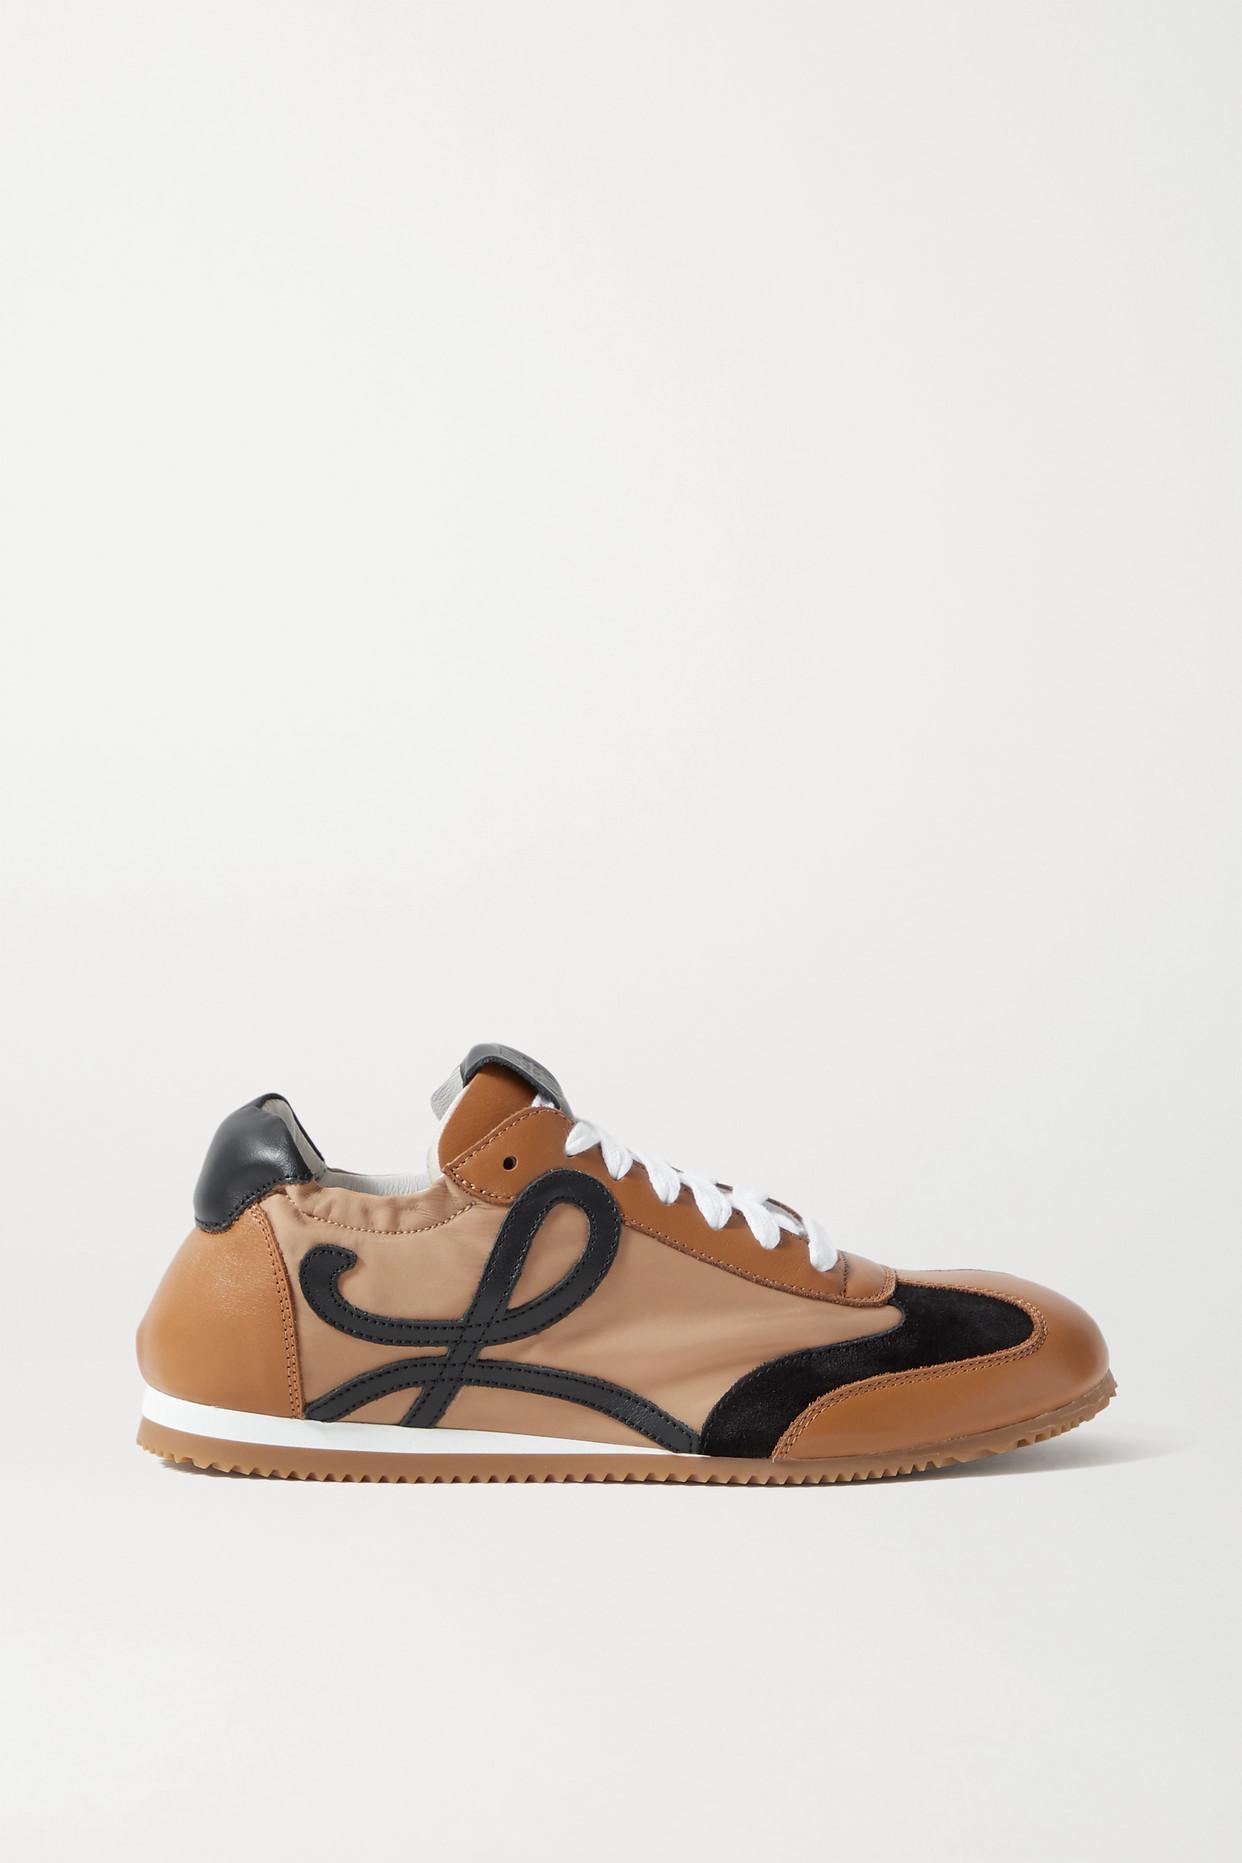 LOEWE - Ballet Runner 软壳面料绒面革皮革运动鞋 - 棕色 - IT40